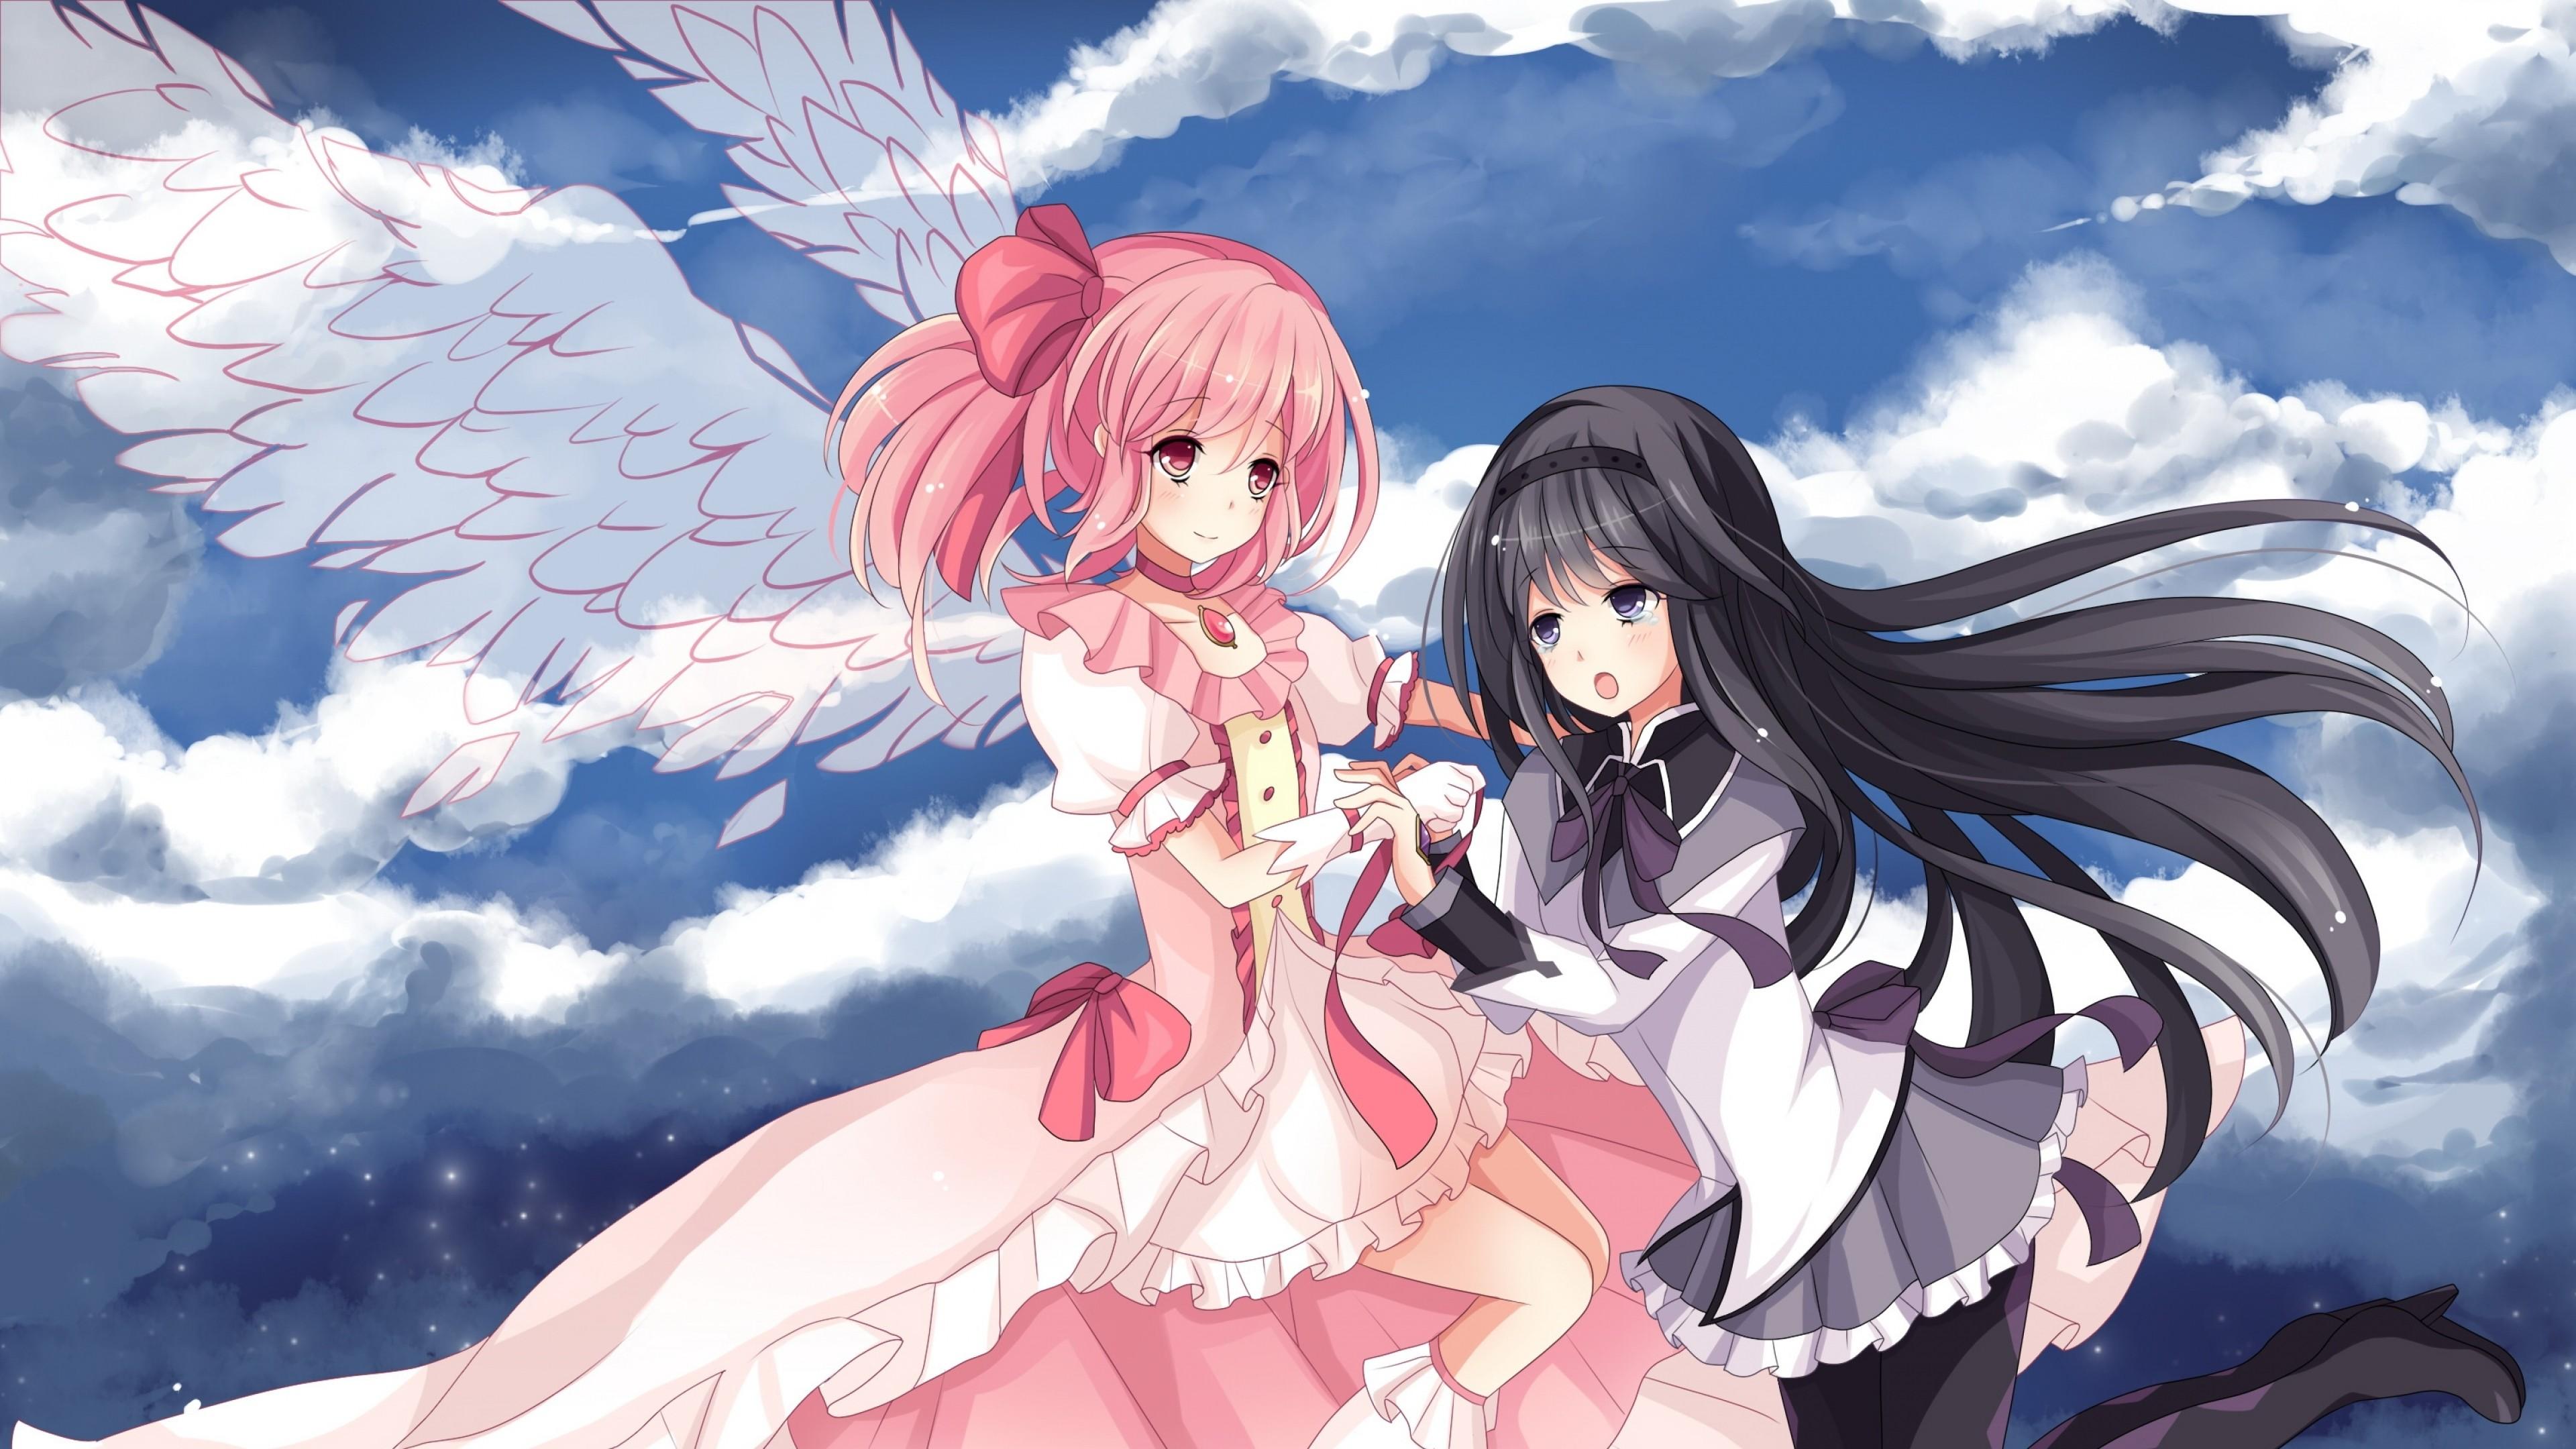 Hd Girl Gun Wallpapers 1080p Mahou Shoujo Madoka Magica Wallpaper 76 Images